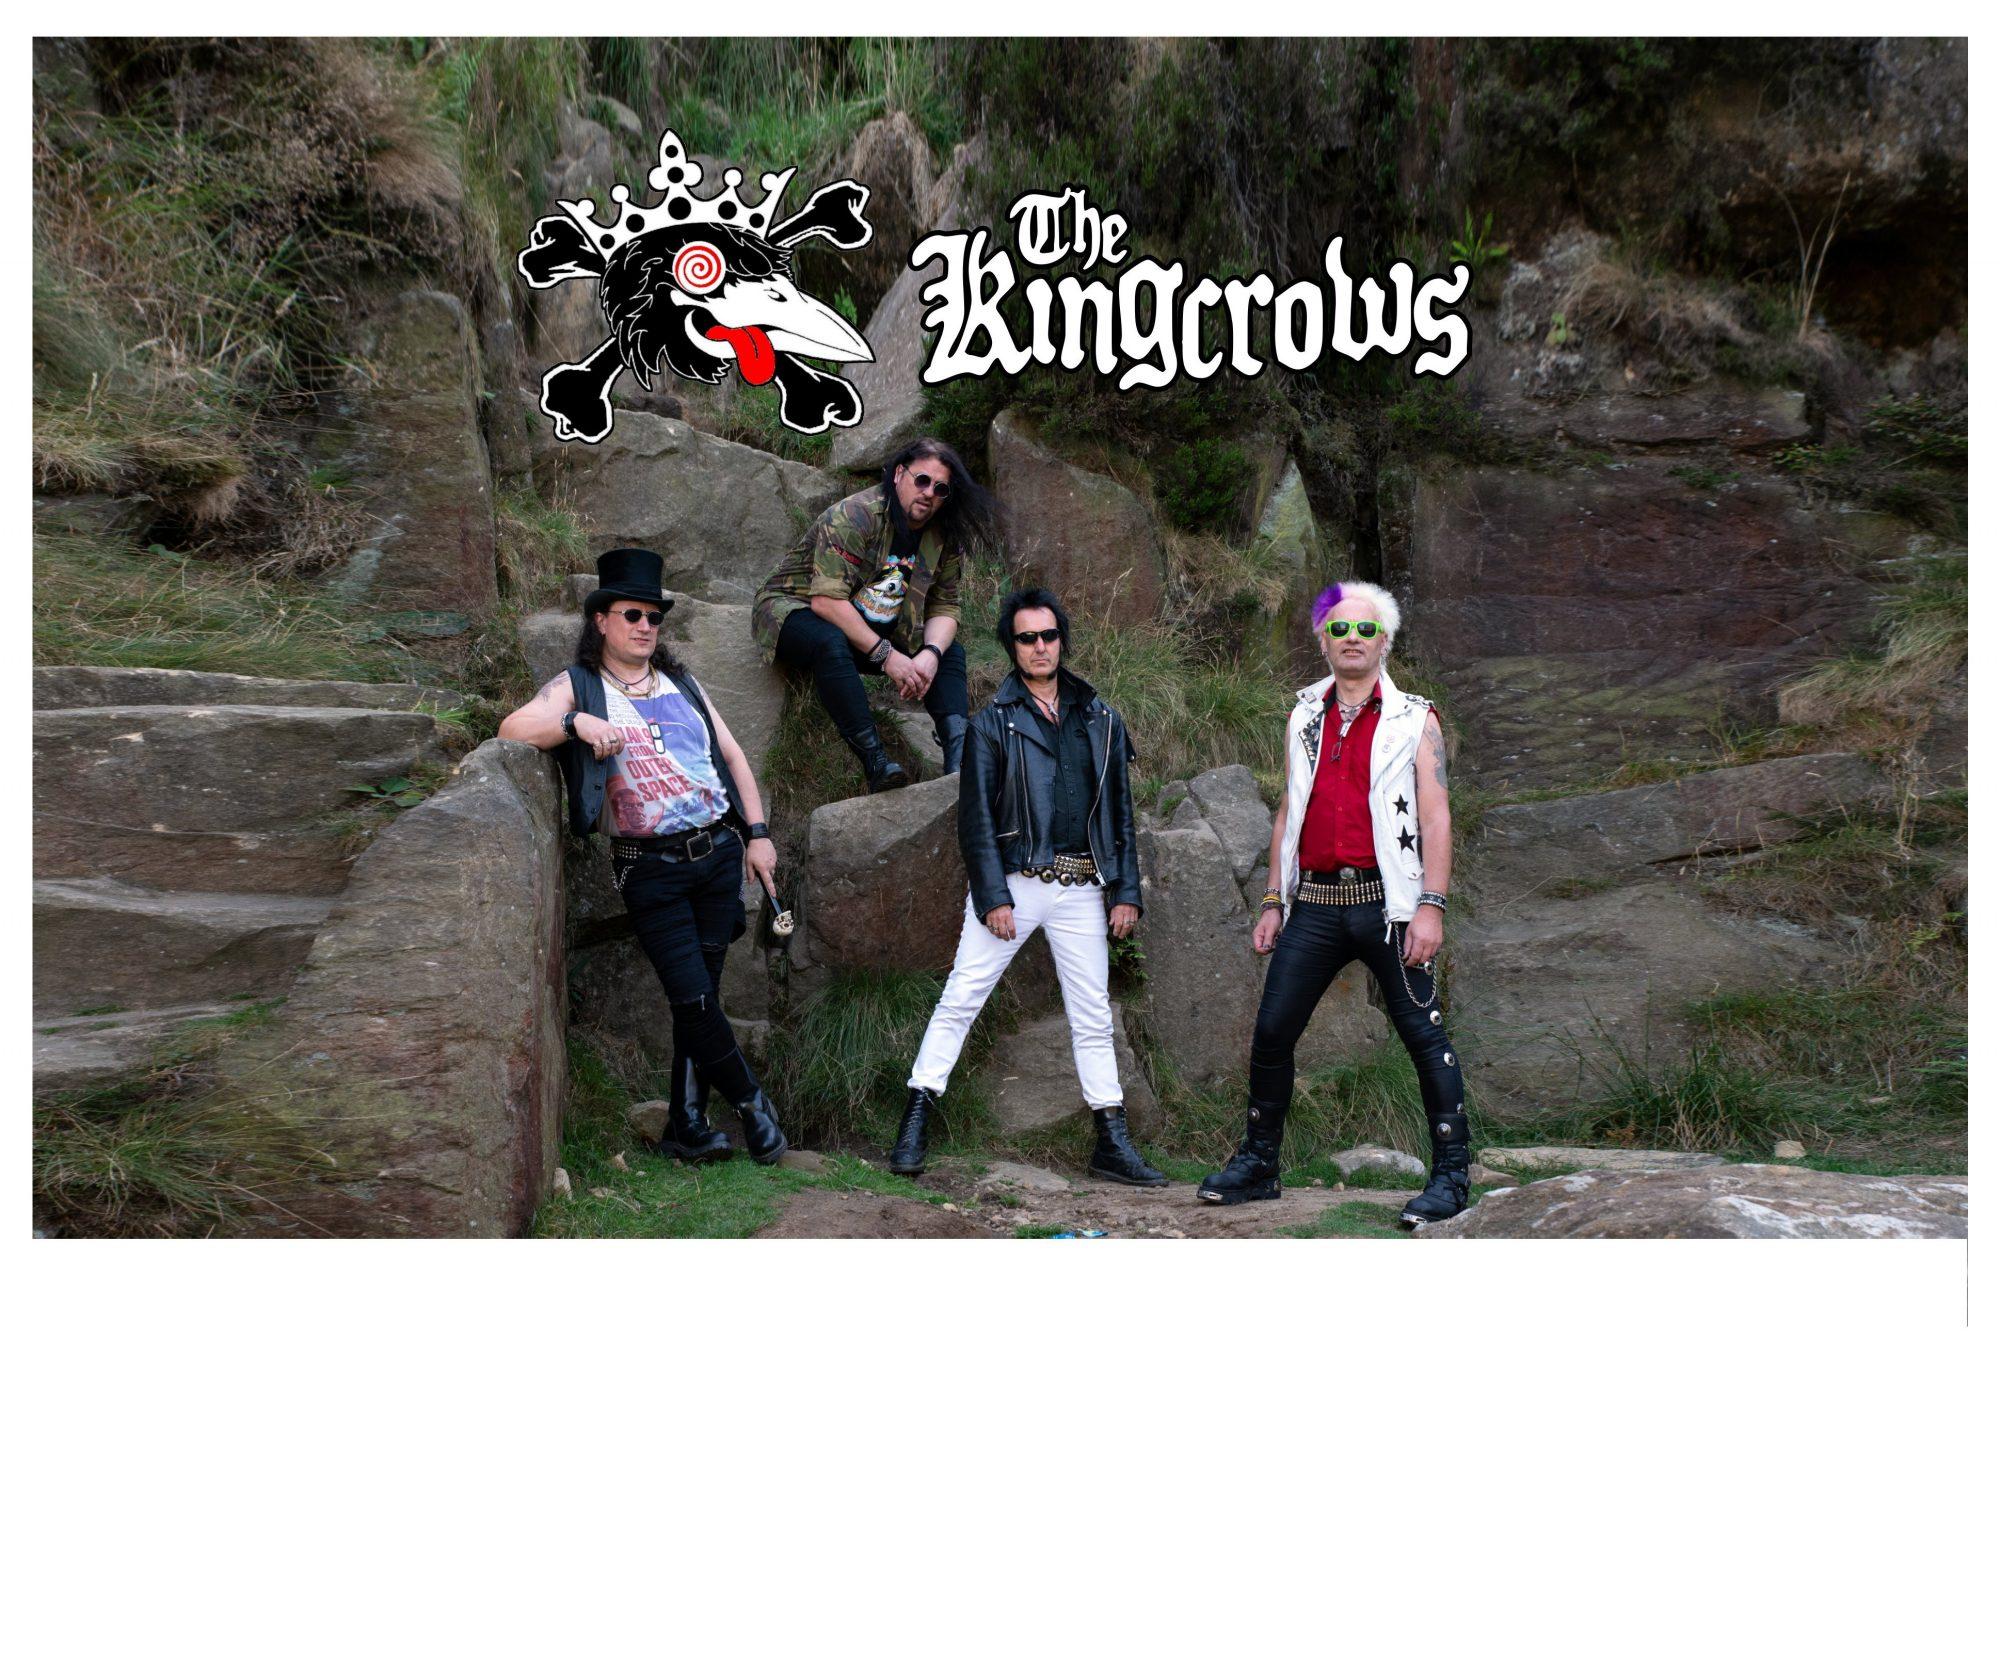 The Kingcrows